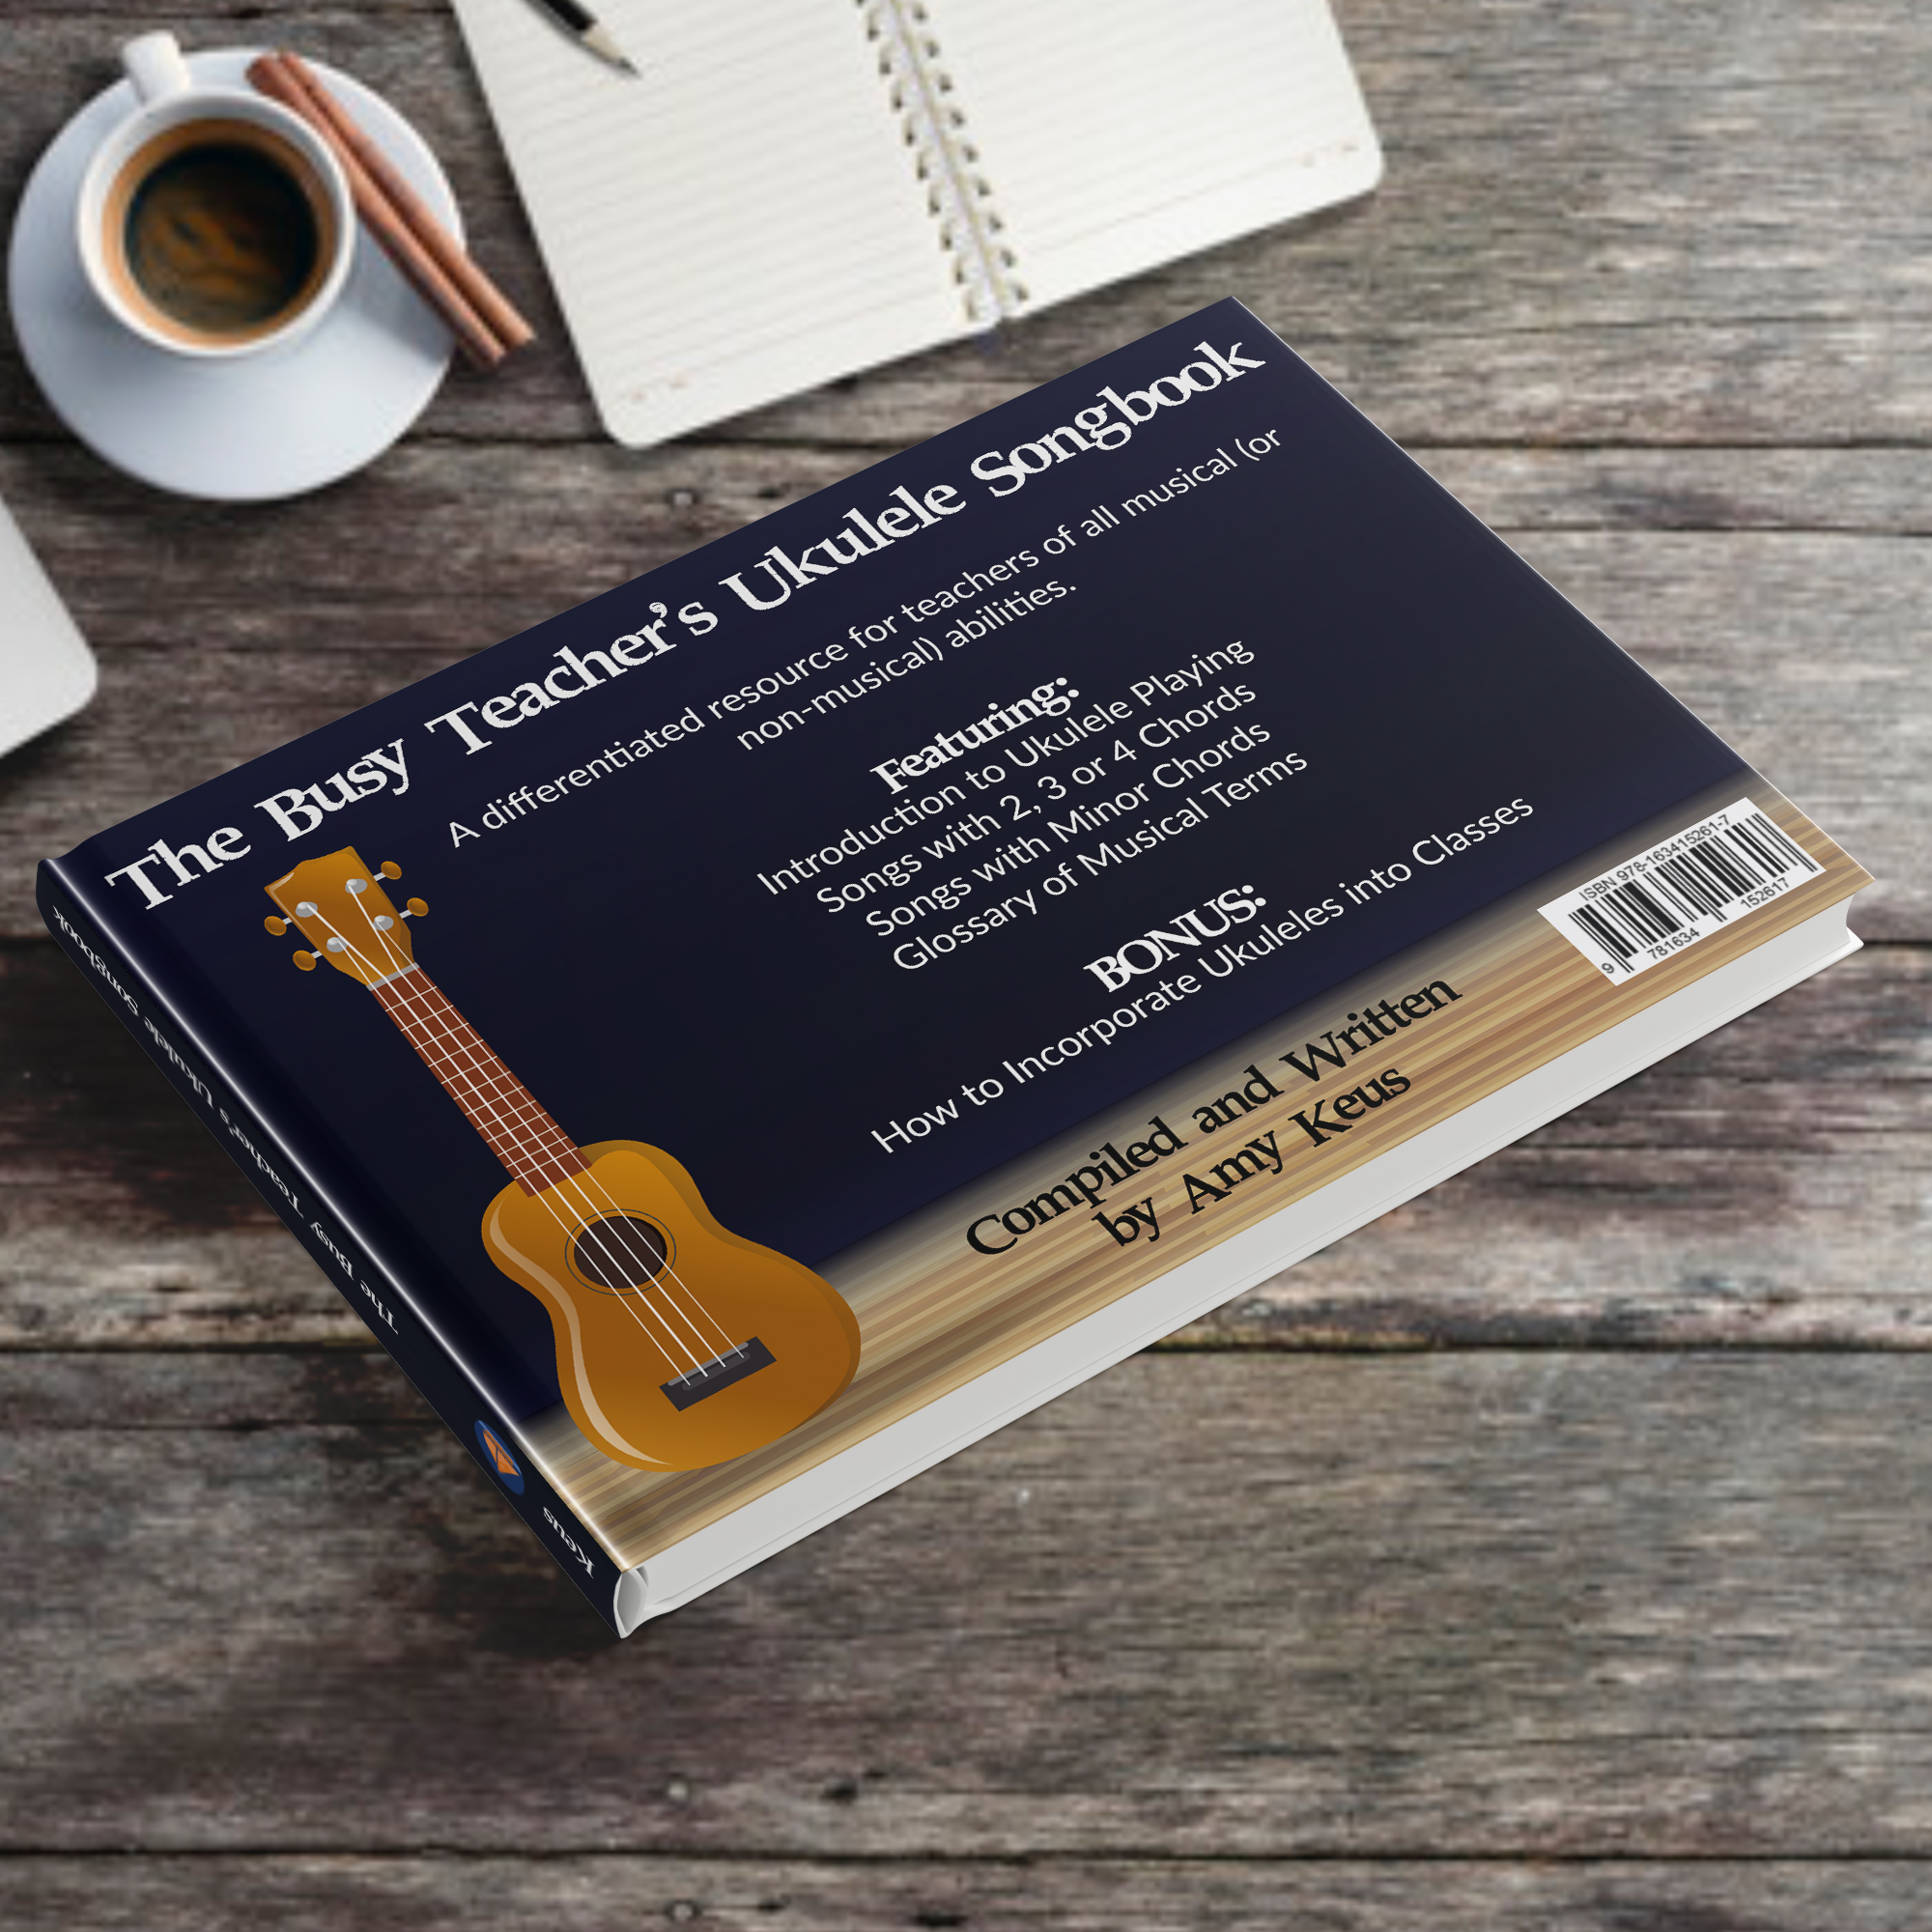 Ukulele Songhbook – Mockup